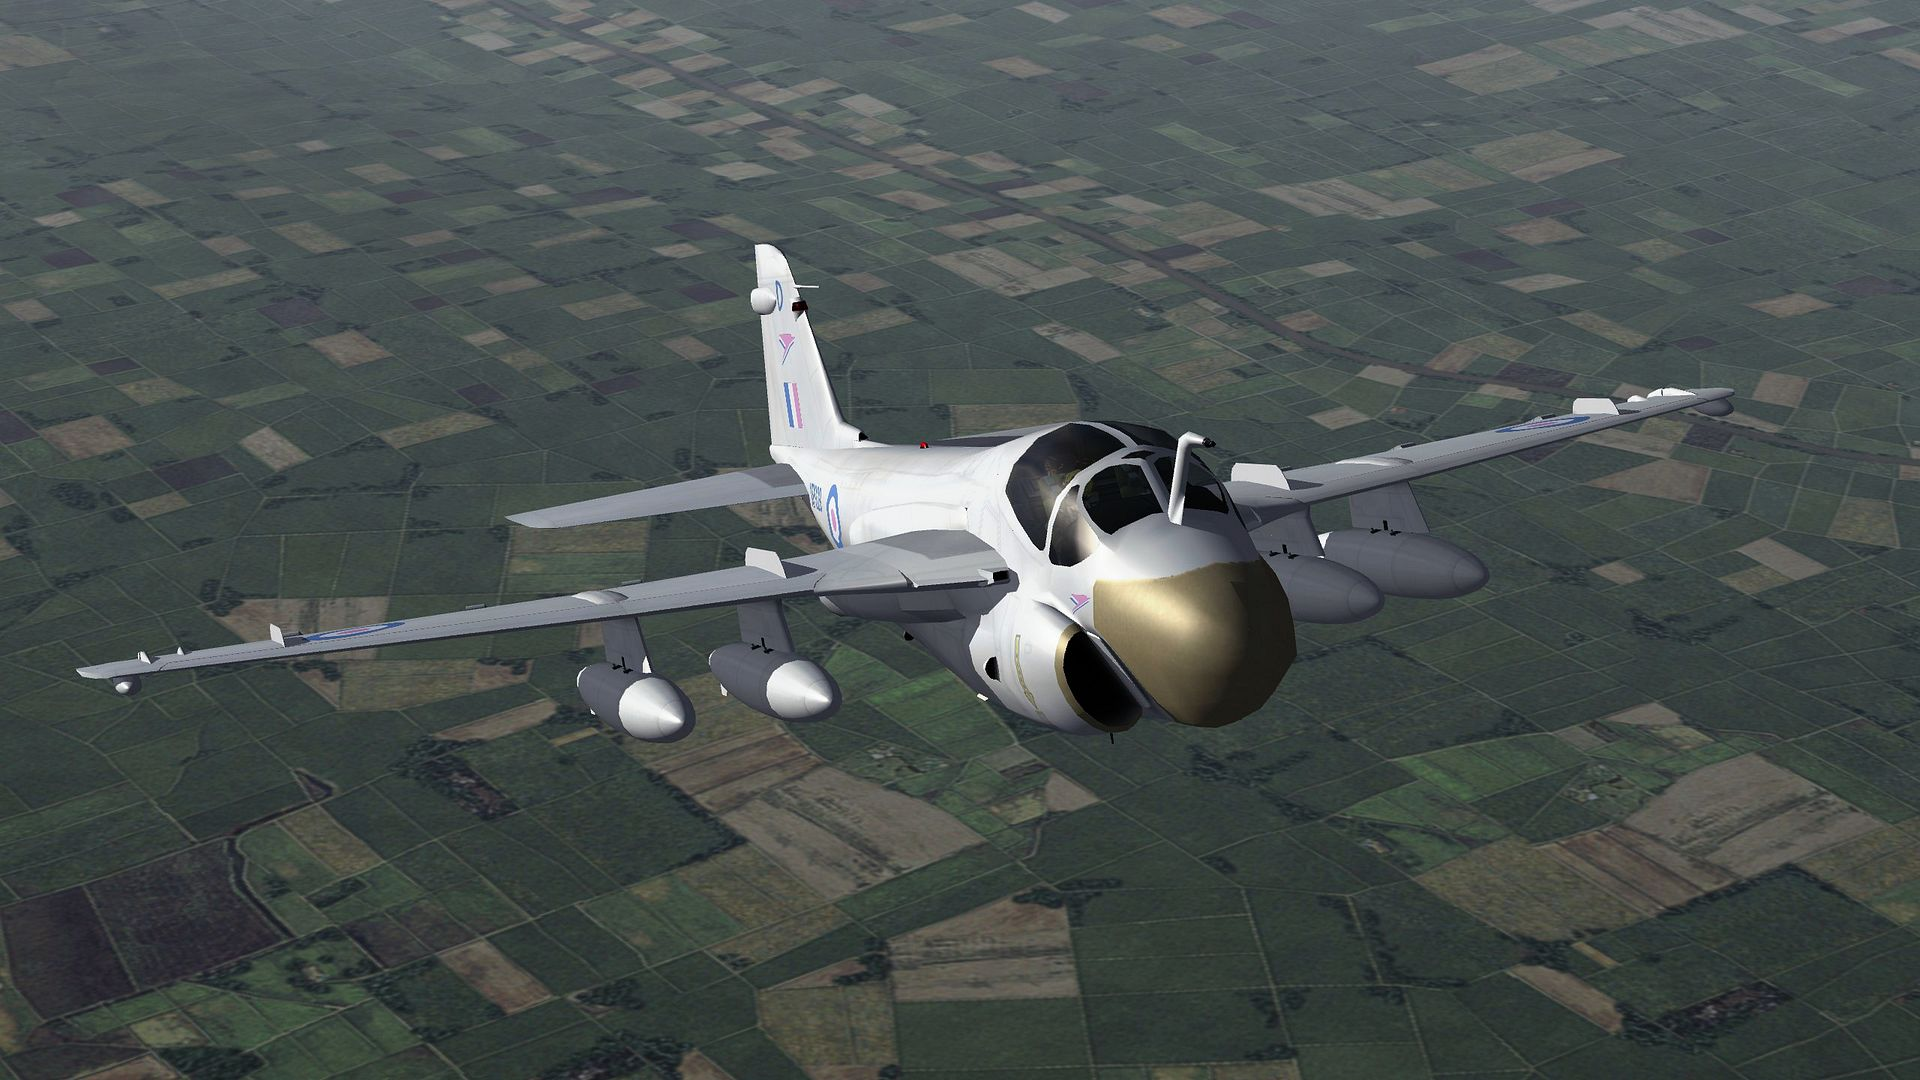 RAF%20INTRUDER%20S1.05_zpsq62u59er.jpg